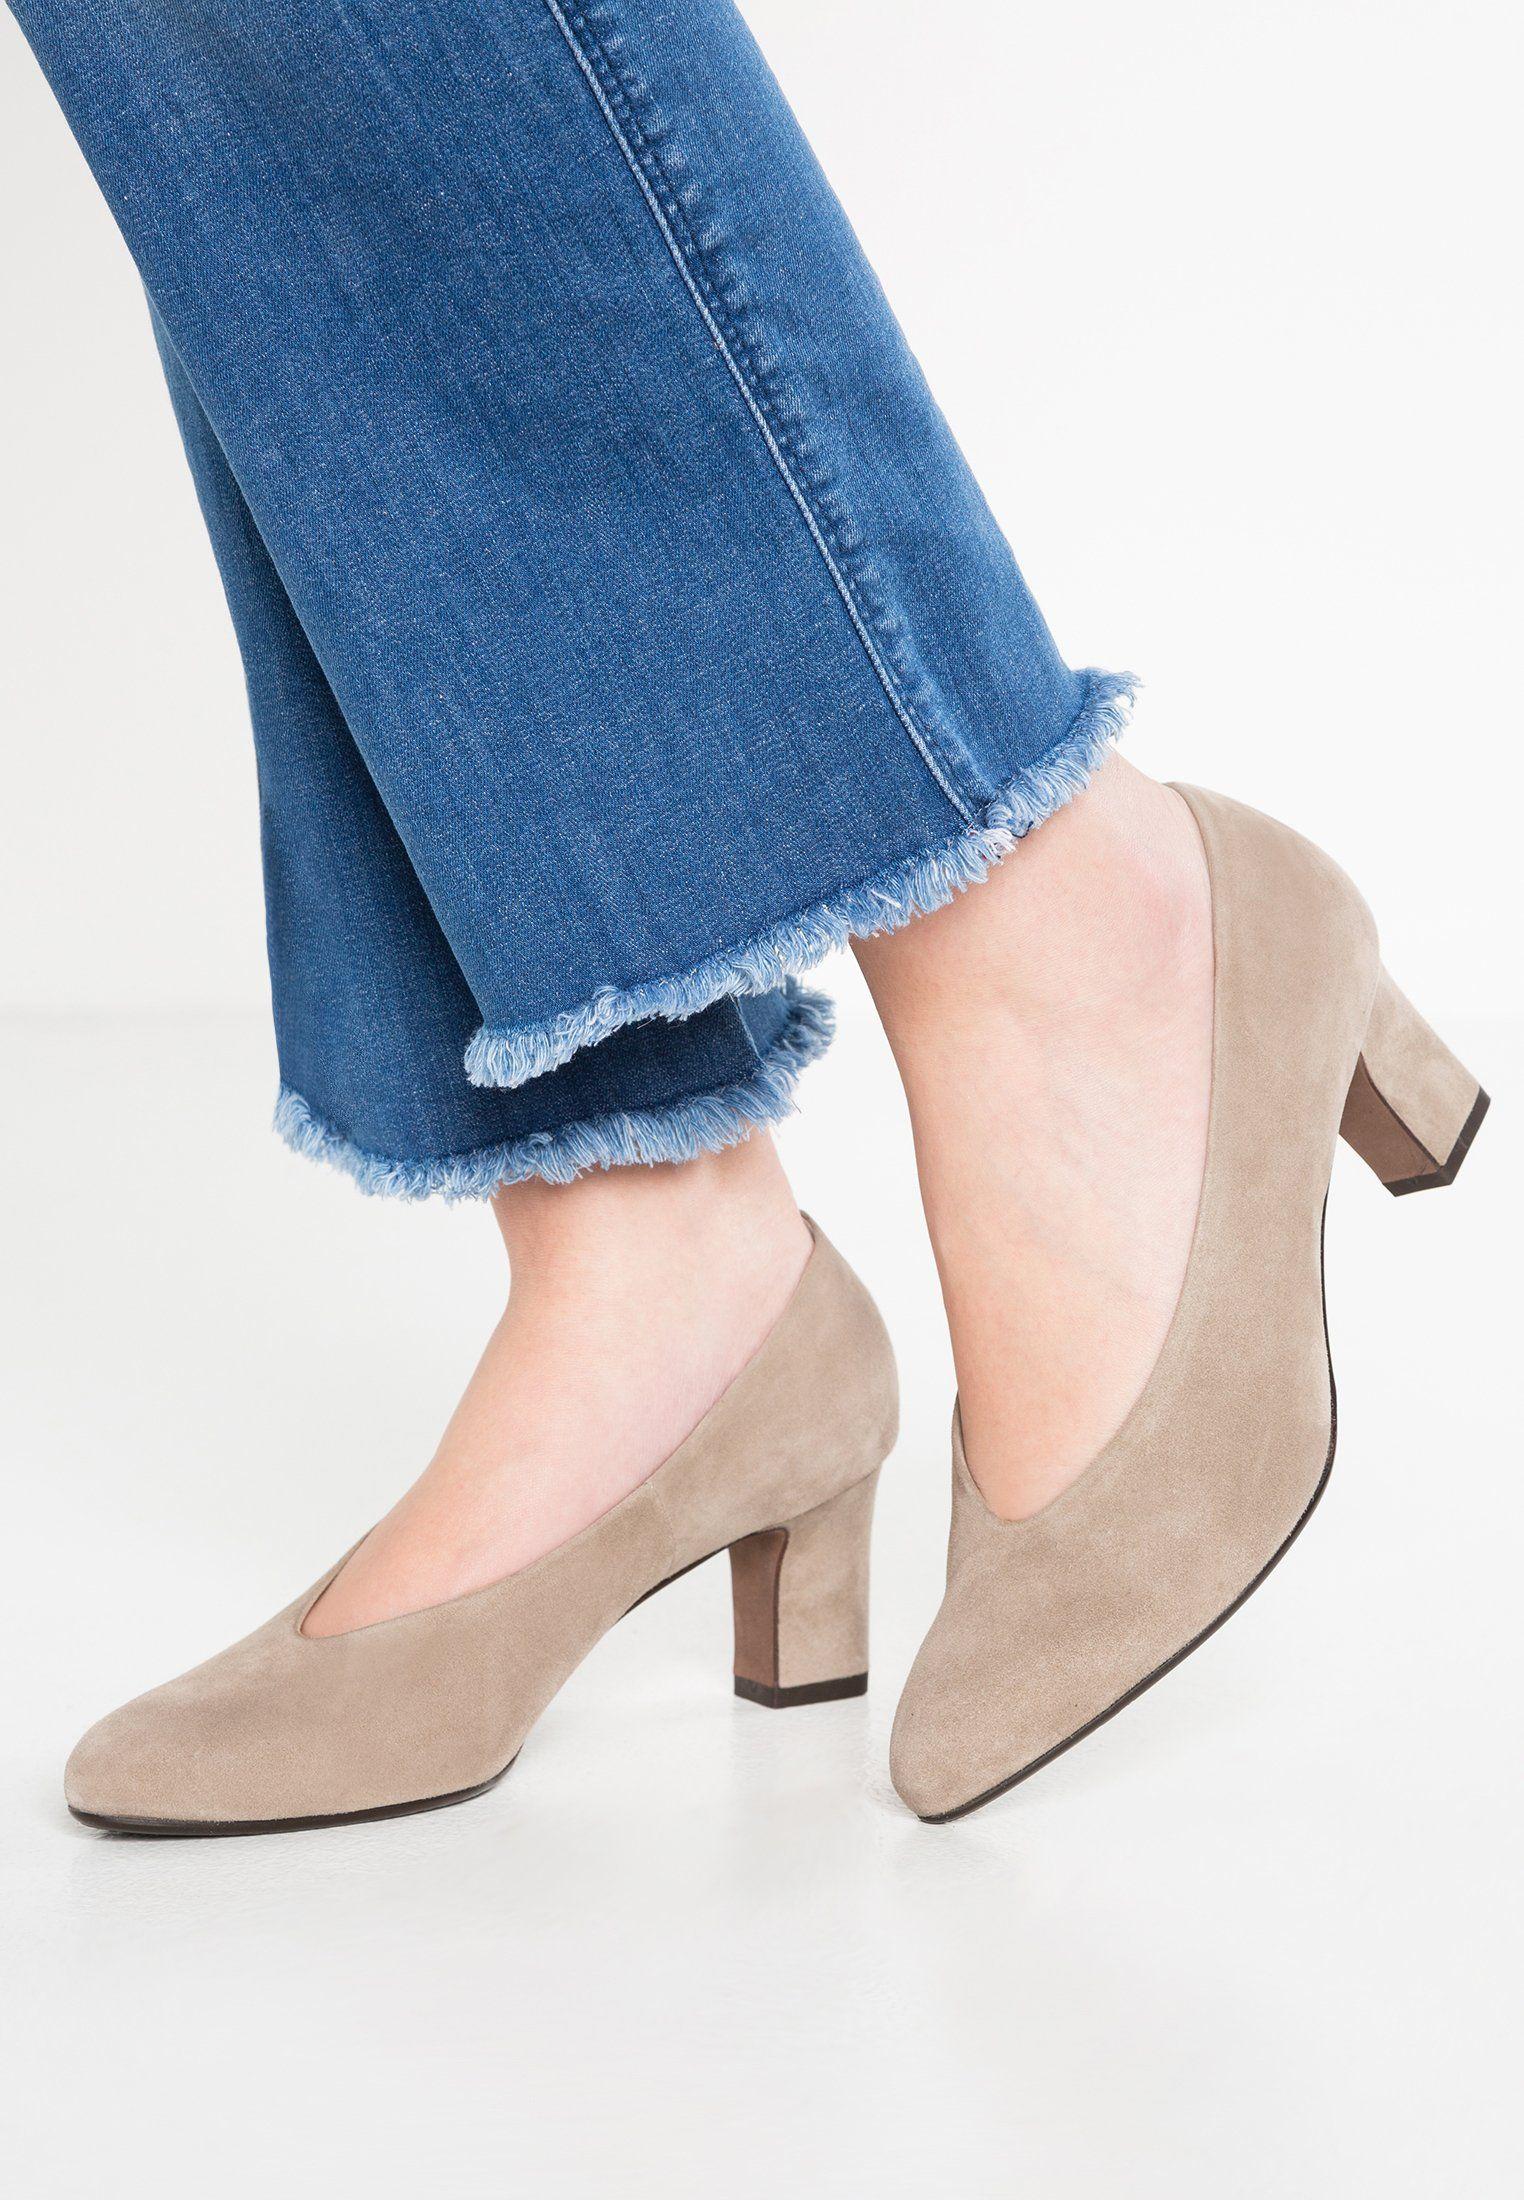 d99495f1d926 Peter Kaiser MAHIRELLA - Classic heels - taupe - Zalando.co.uk ...